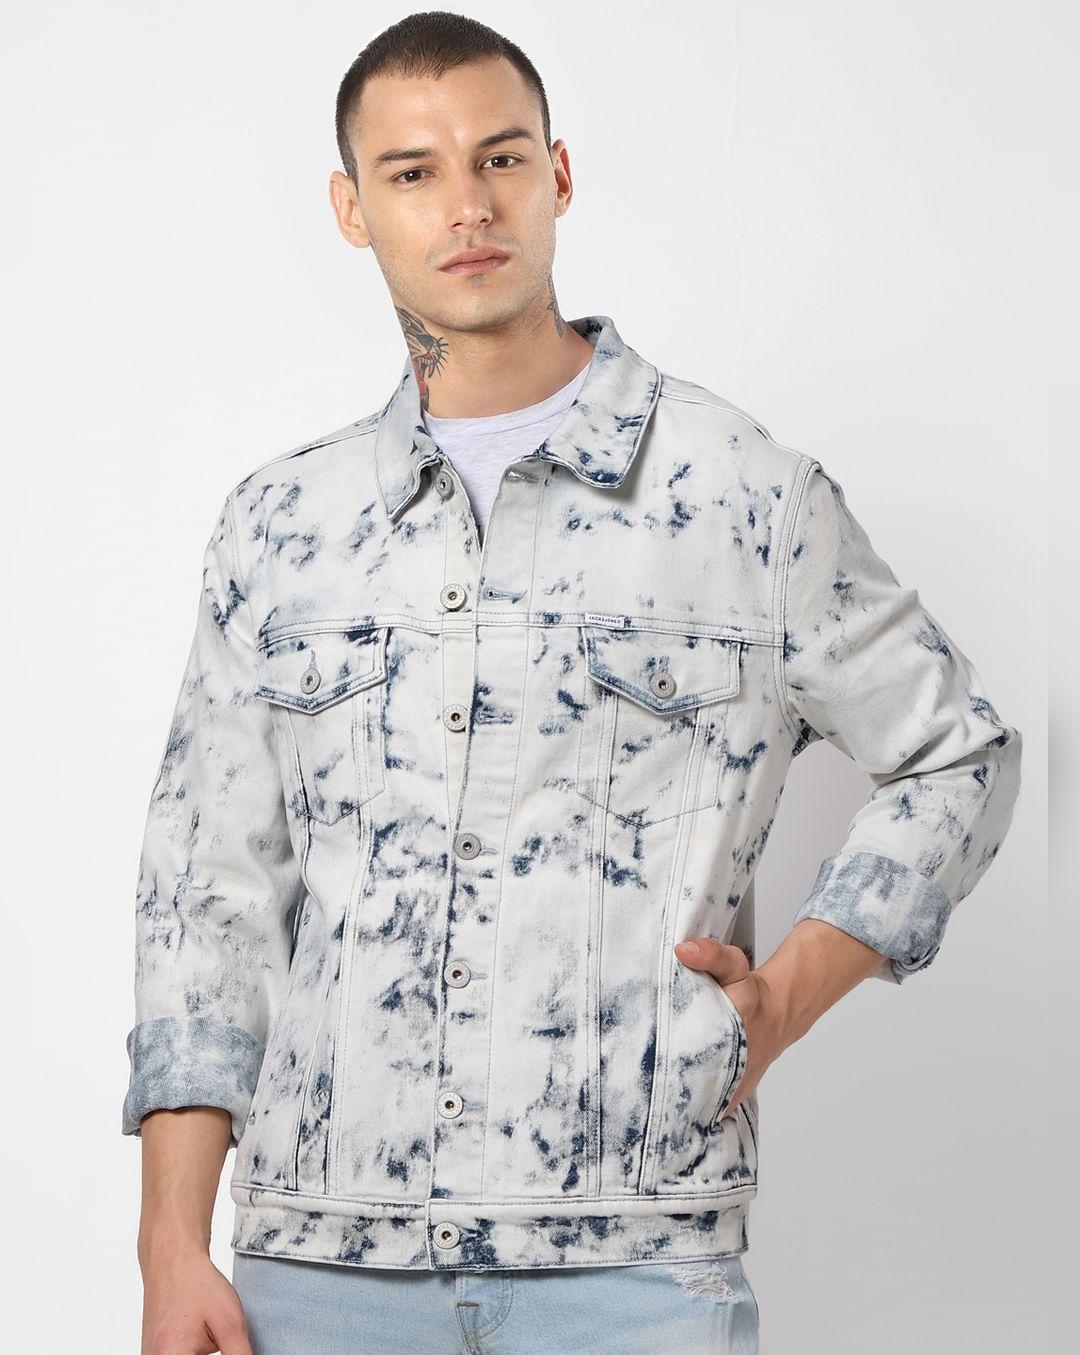 Mens Acid Washed Colour Denim Shirt